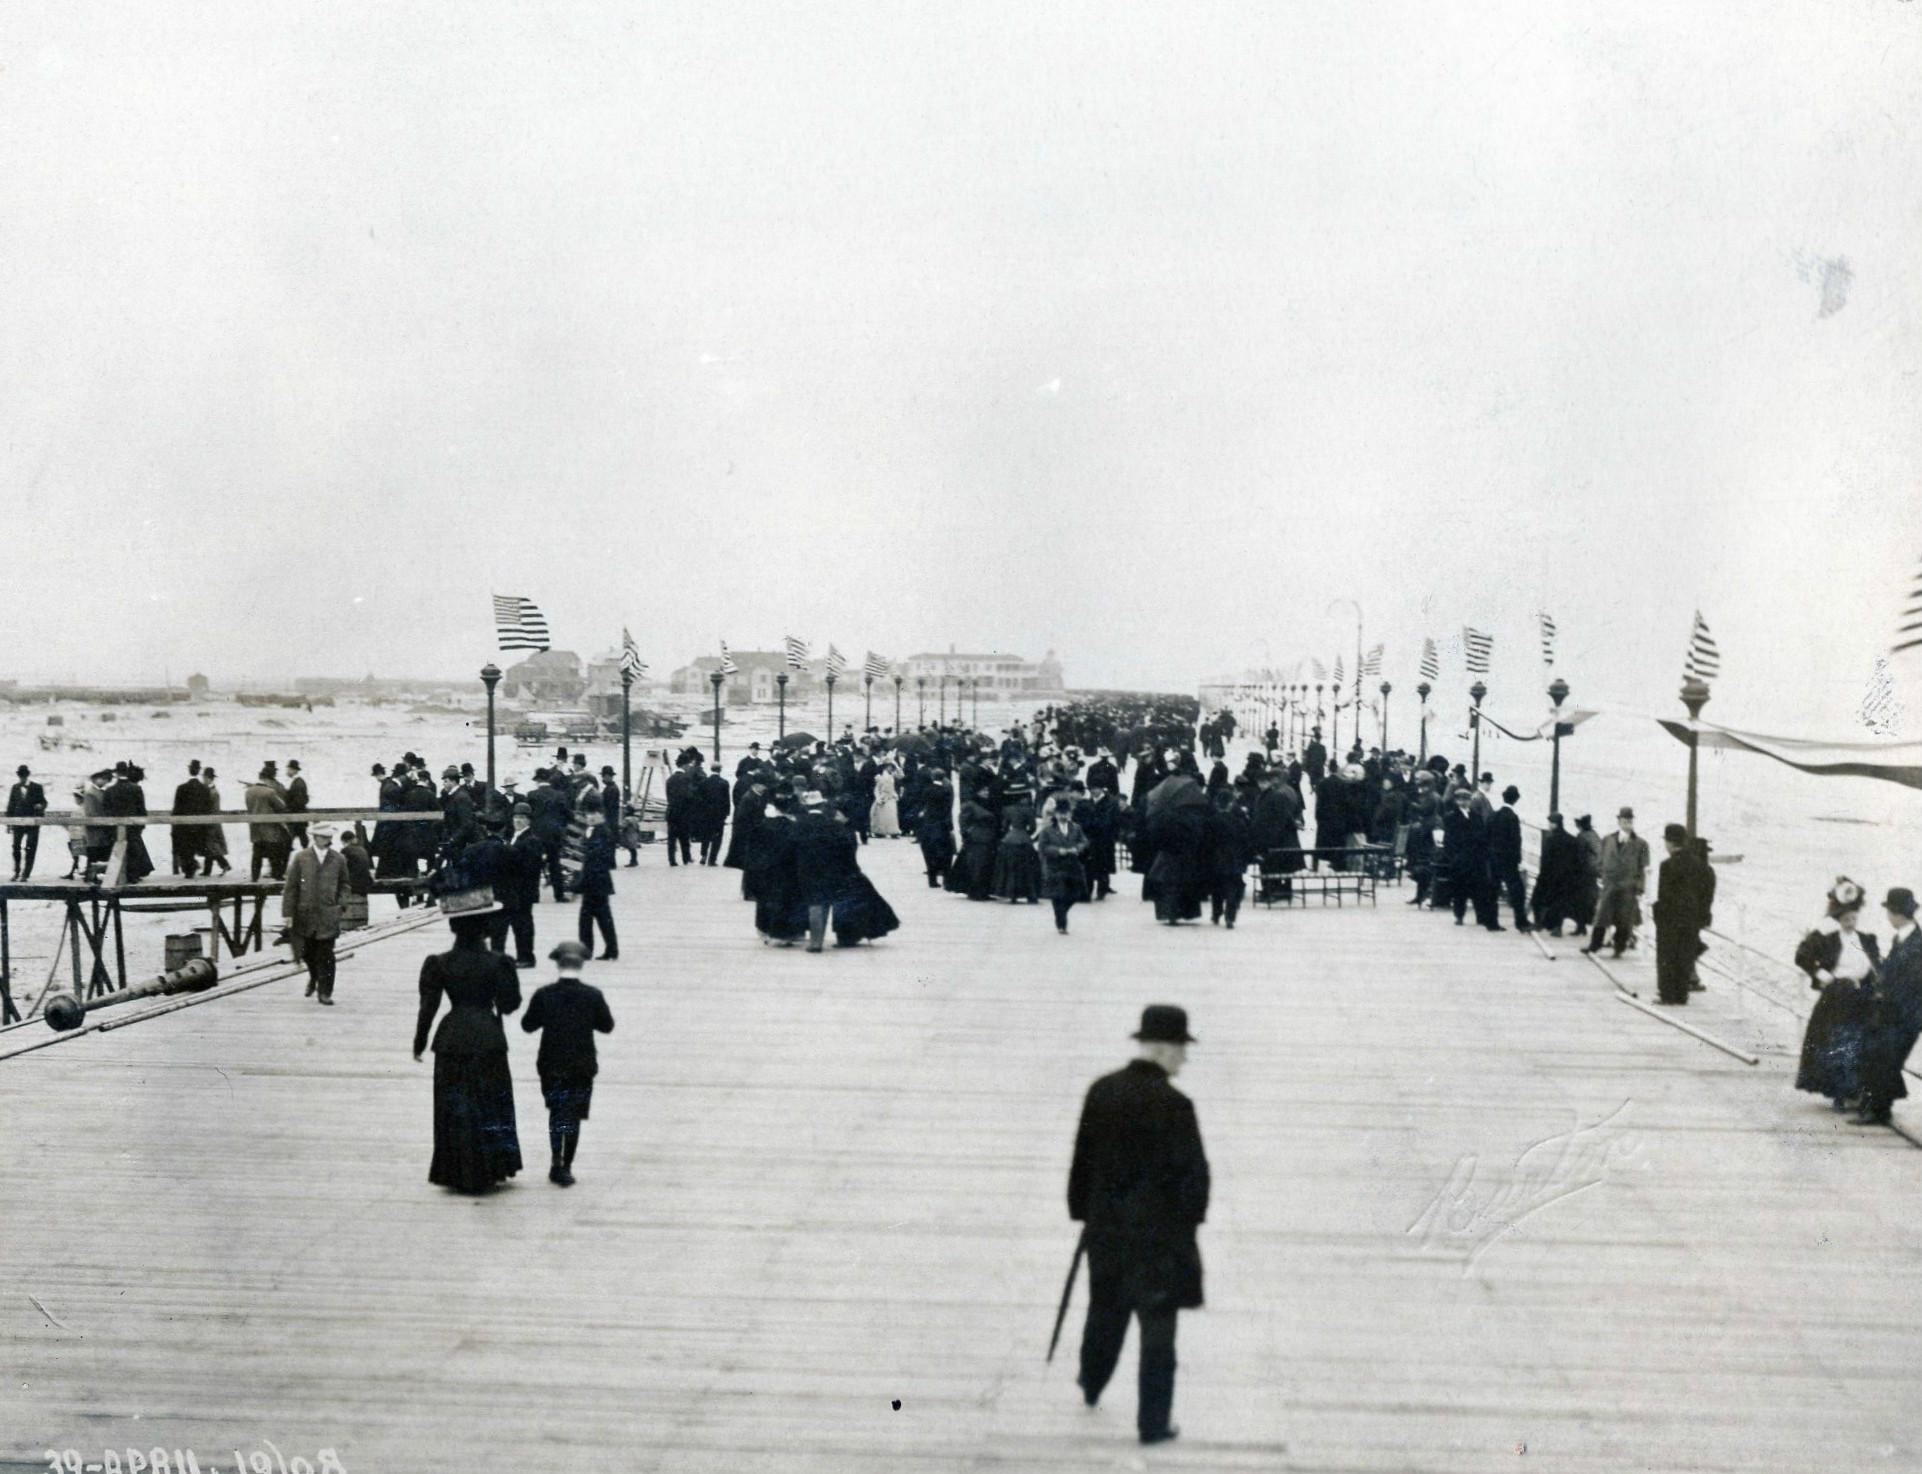 April 30, 1908